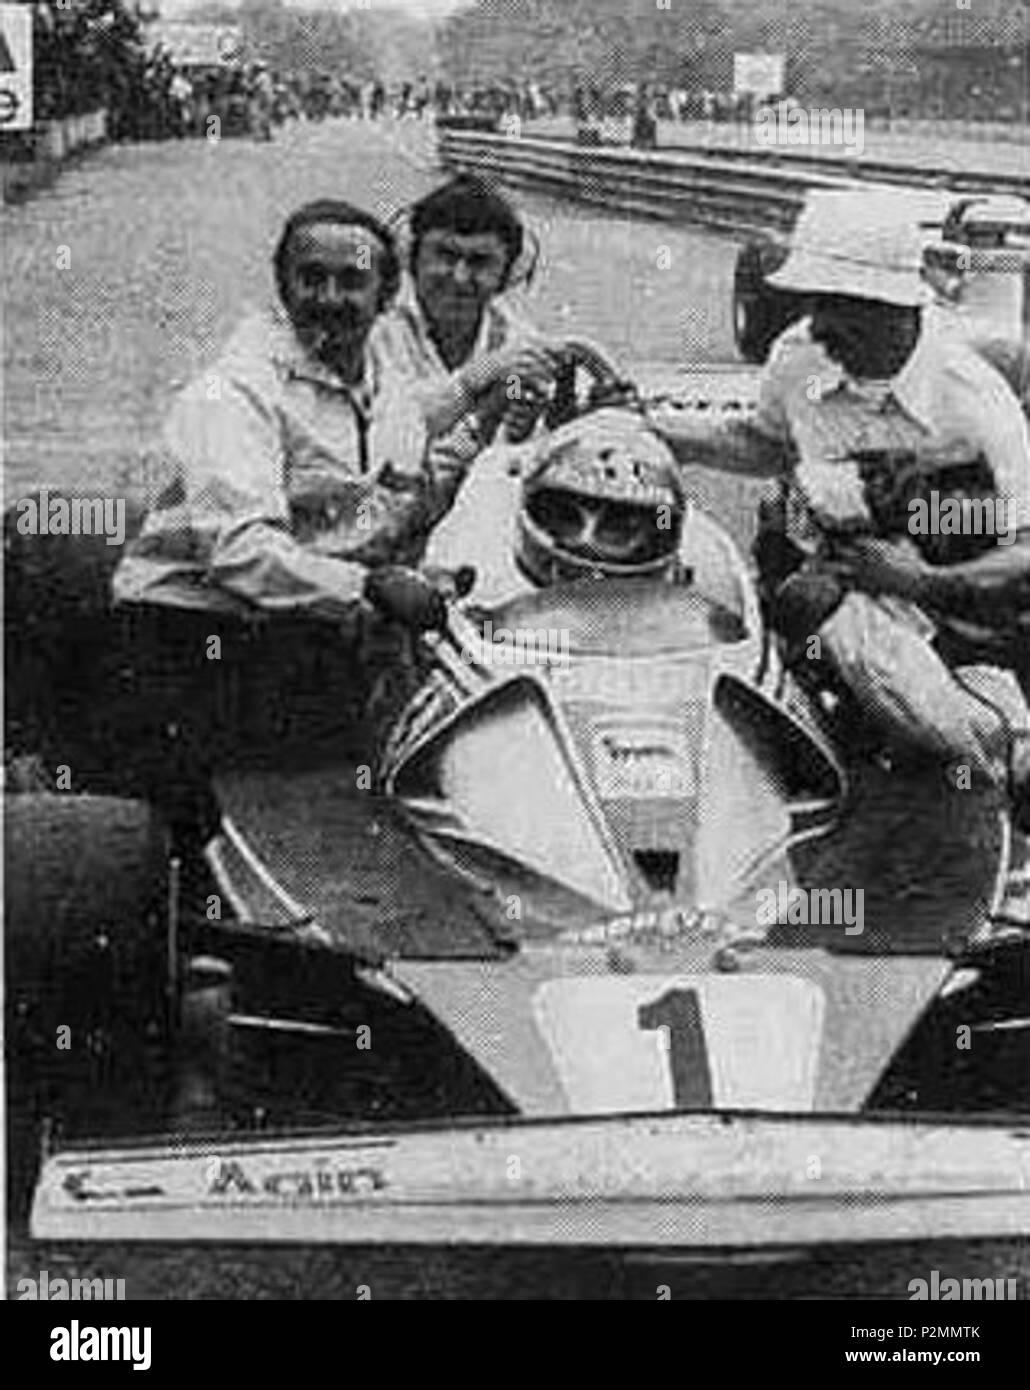 Bobby Rahal Mercedes >> Lauda 1976 Stock Photos & Lauda 1976 Stock Images - Alamy